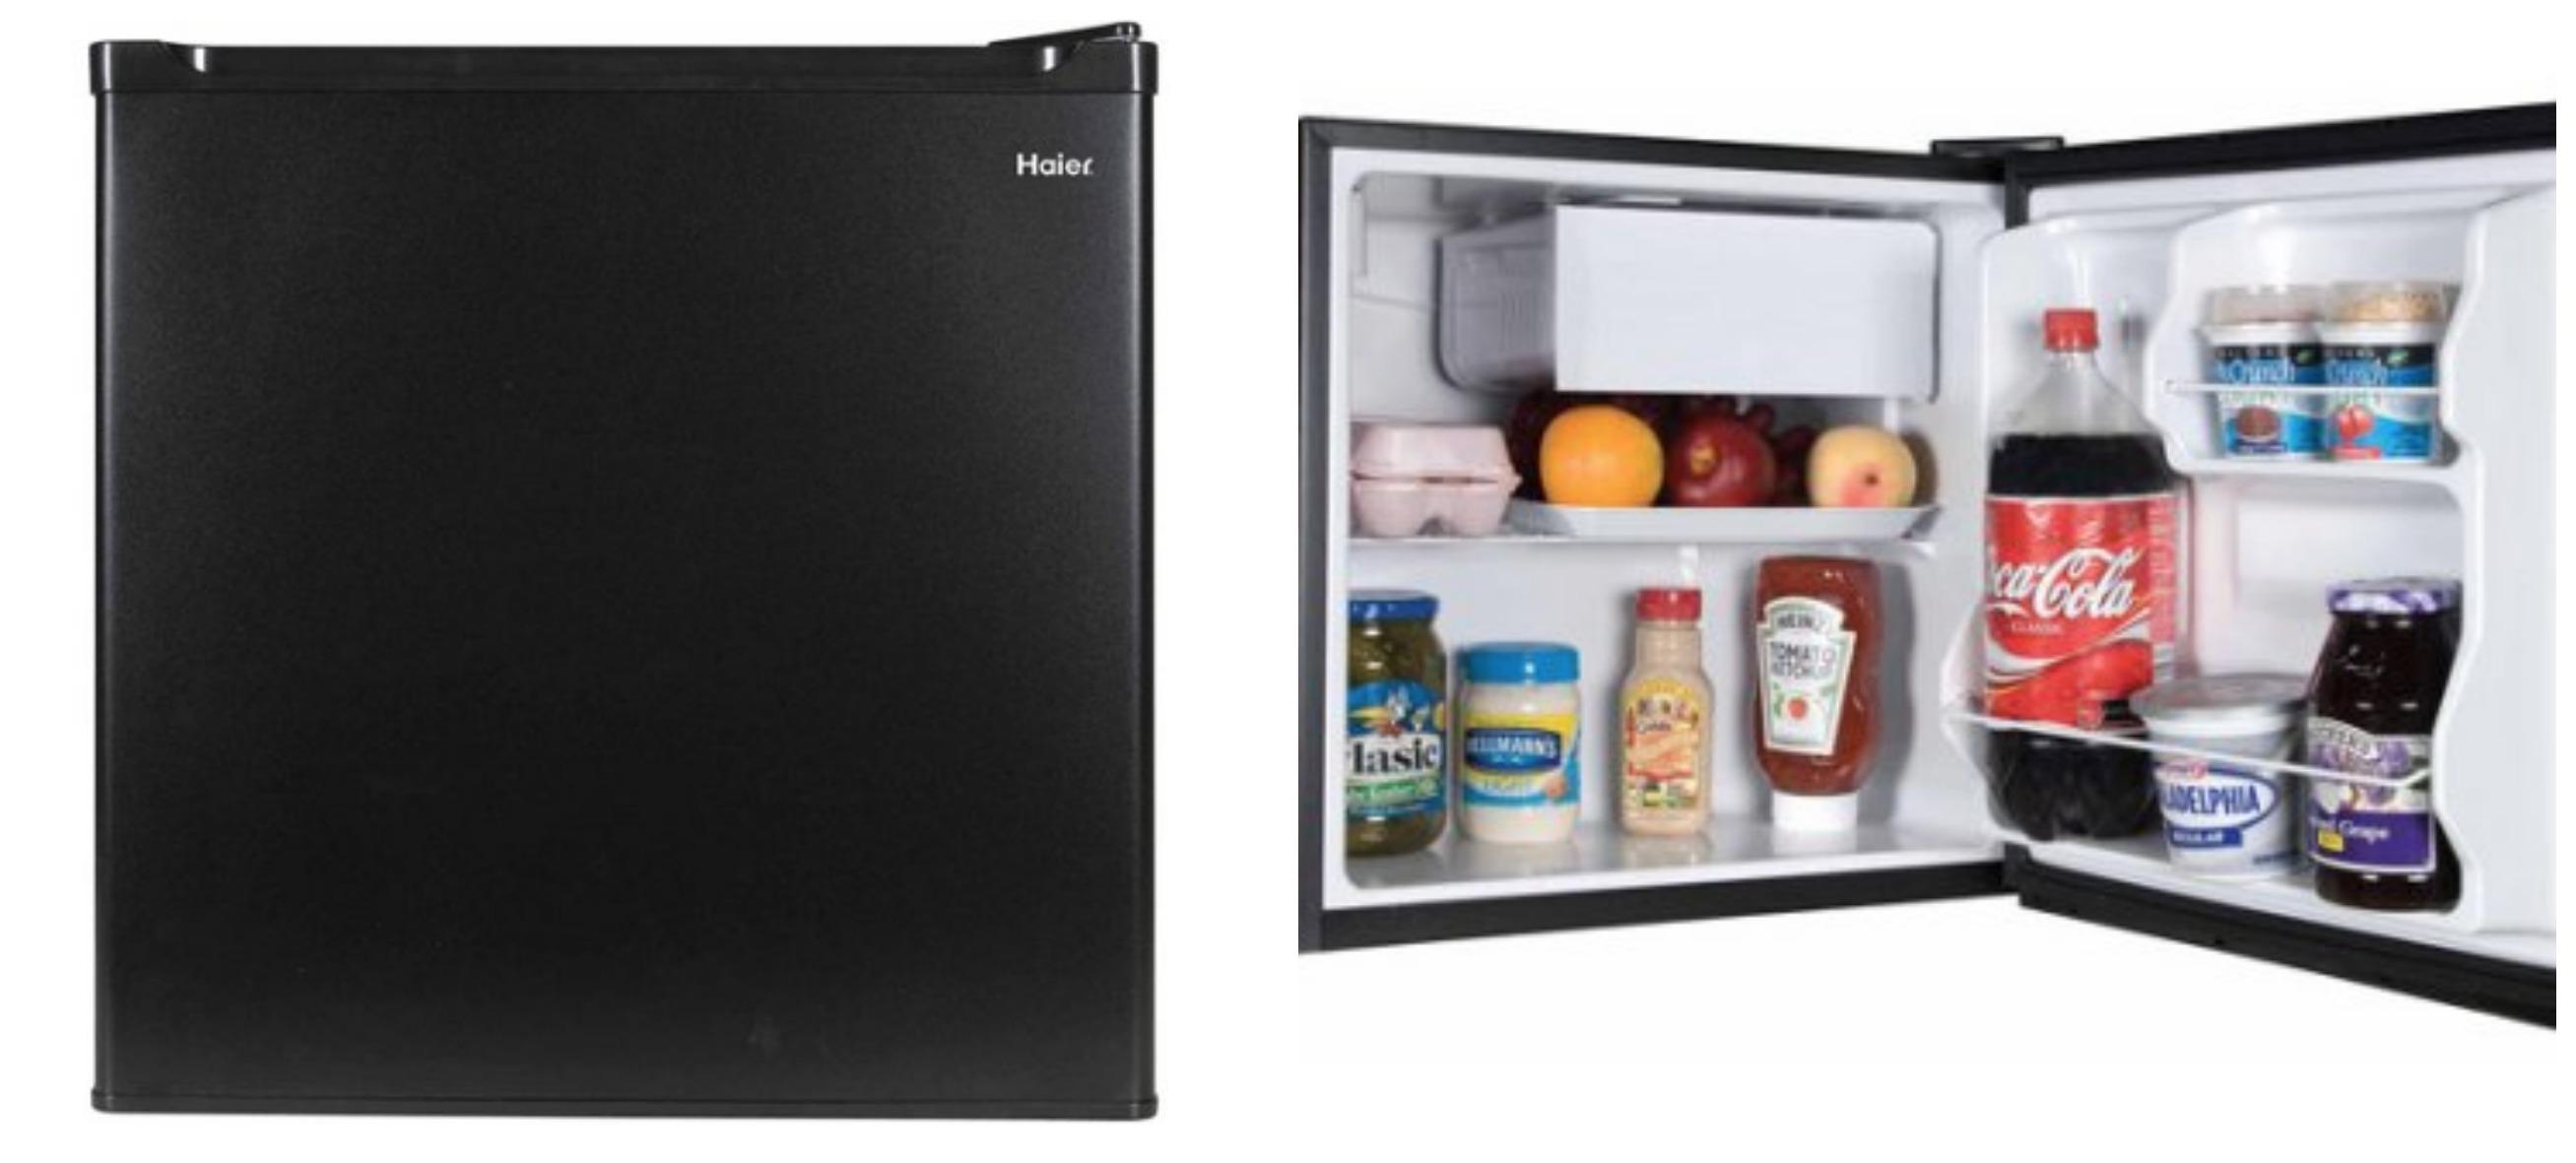 freebies2deals-fridge